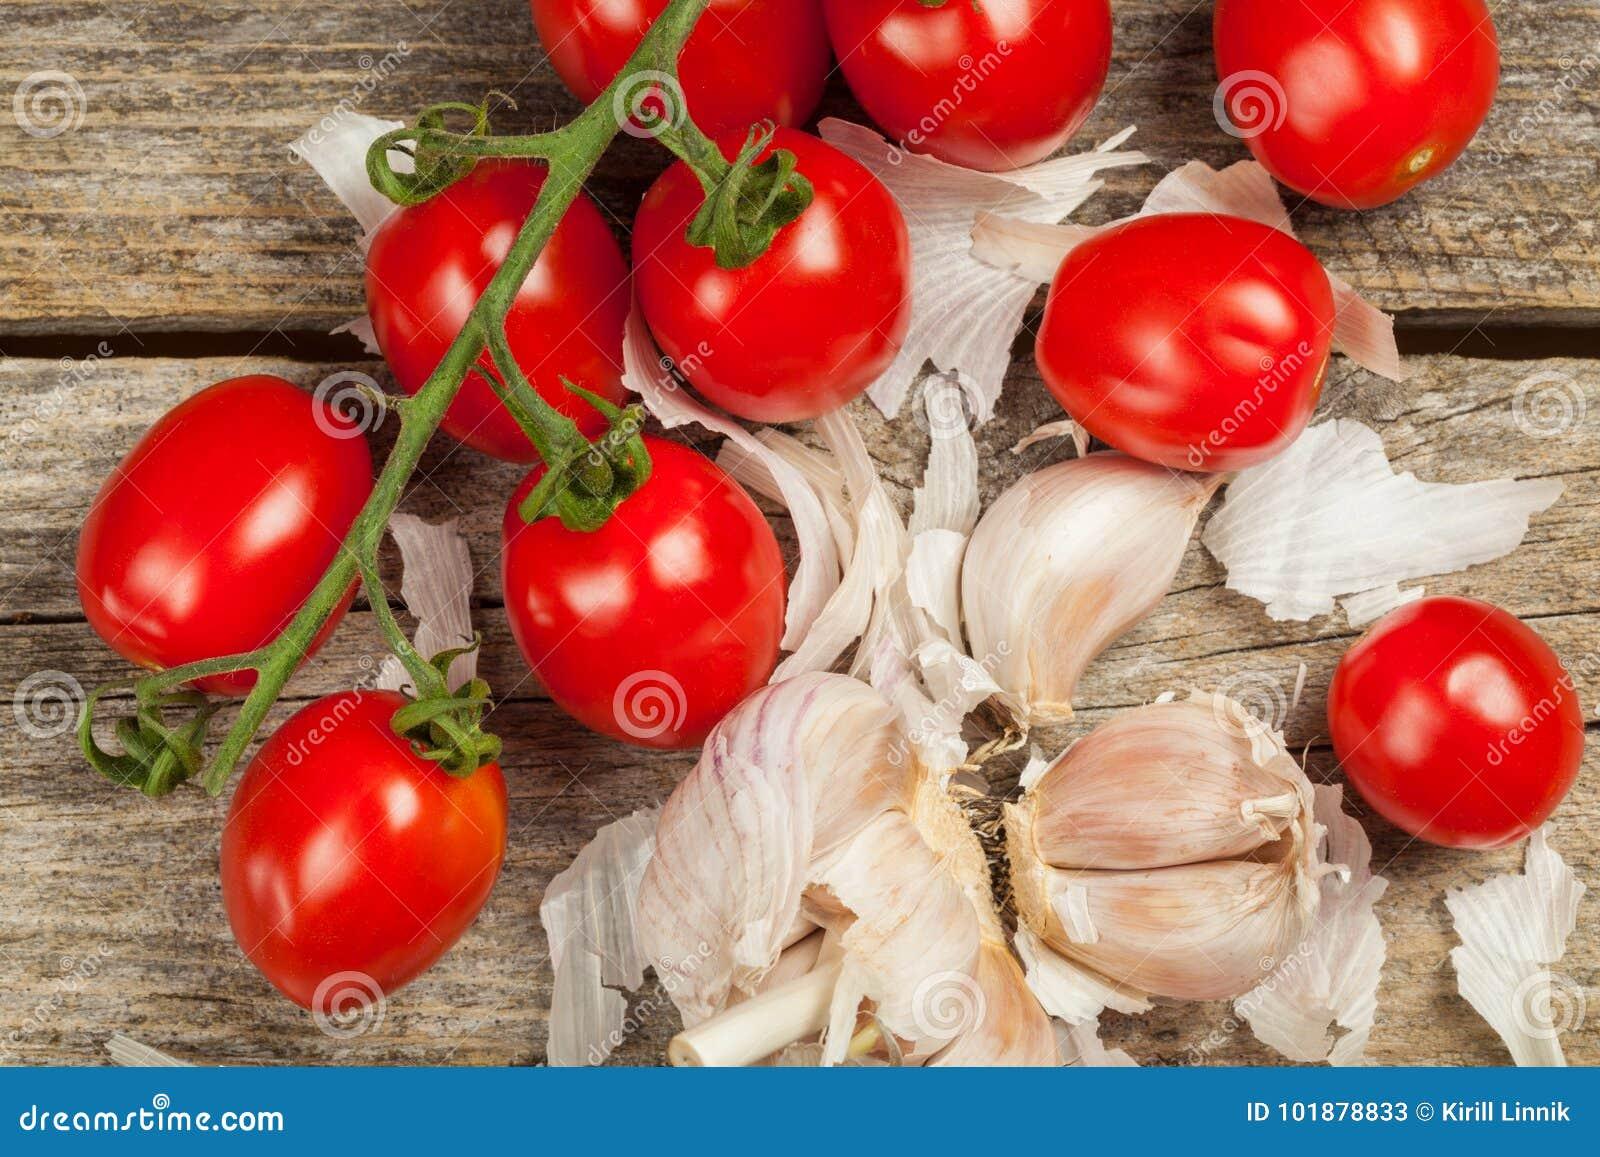 Download Tomatoes and garlic stock image. Image of macro, food - 101878833